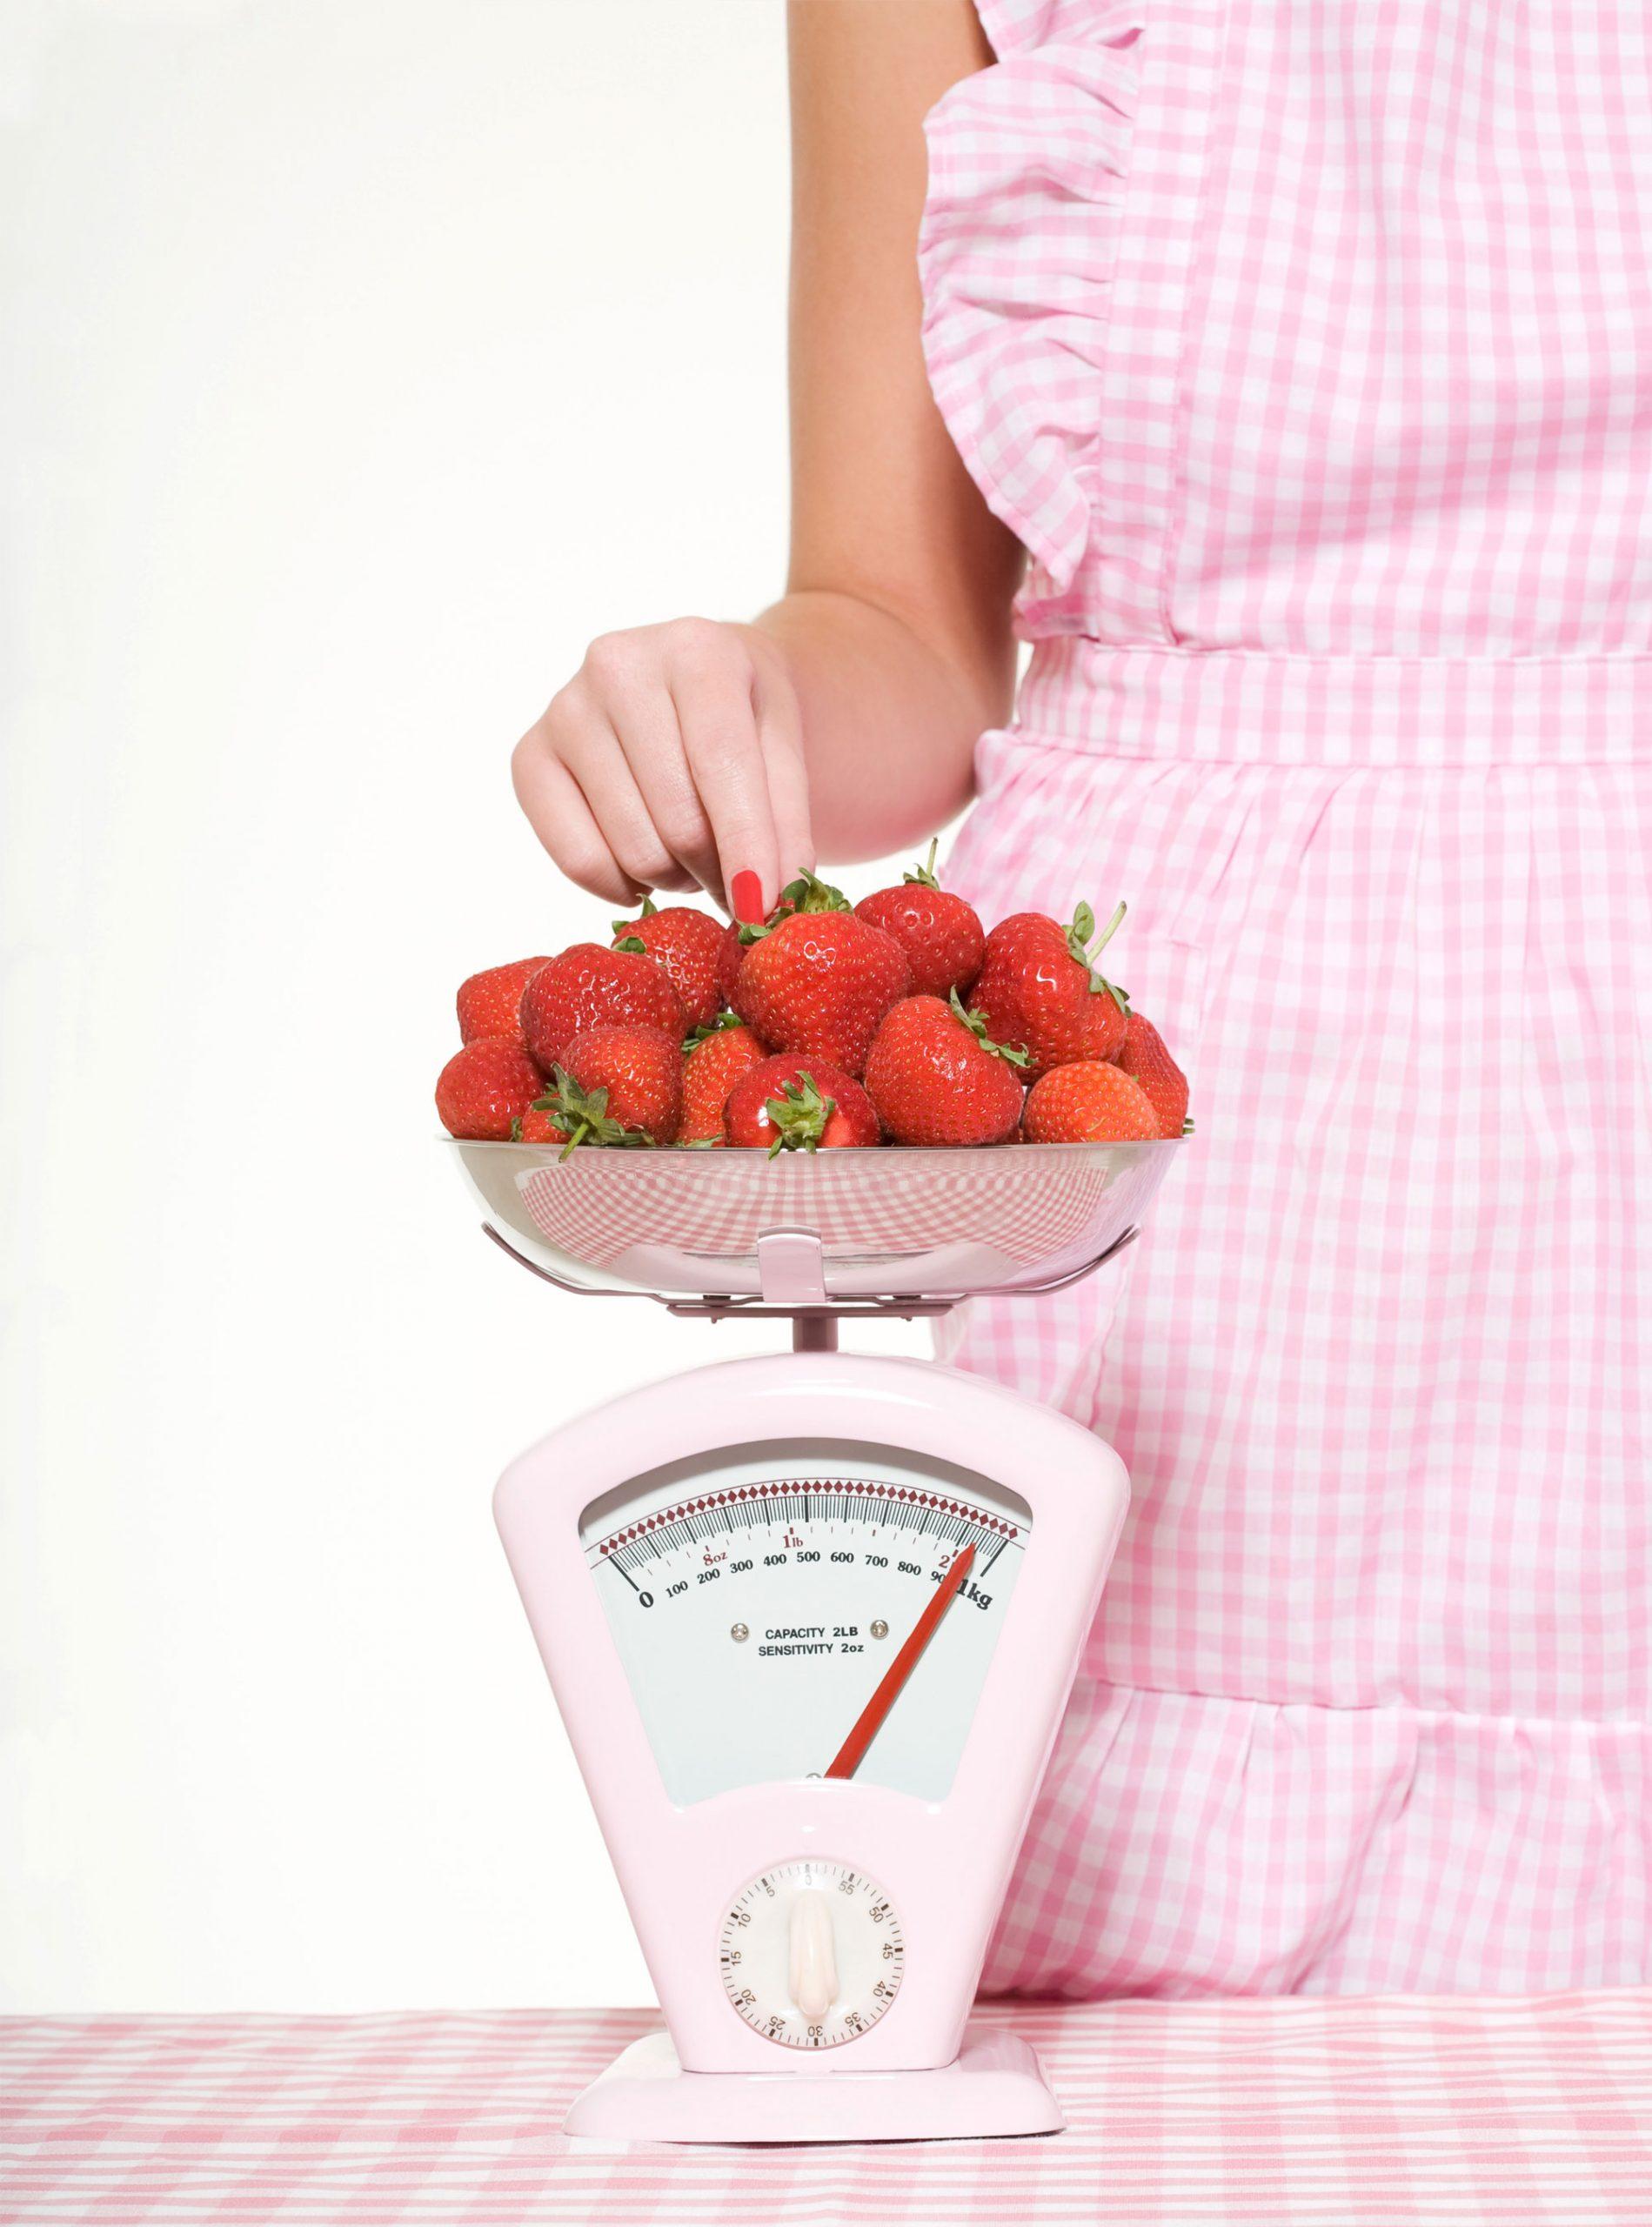 Woman-weighing-strawberries photo